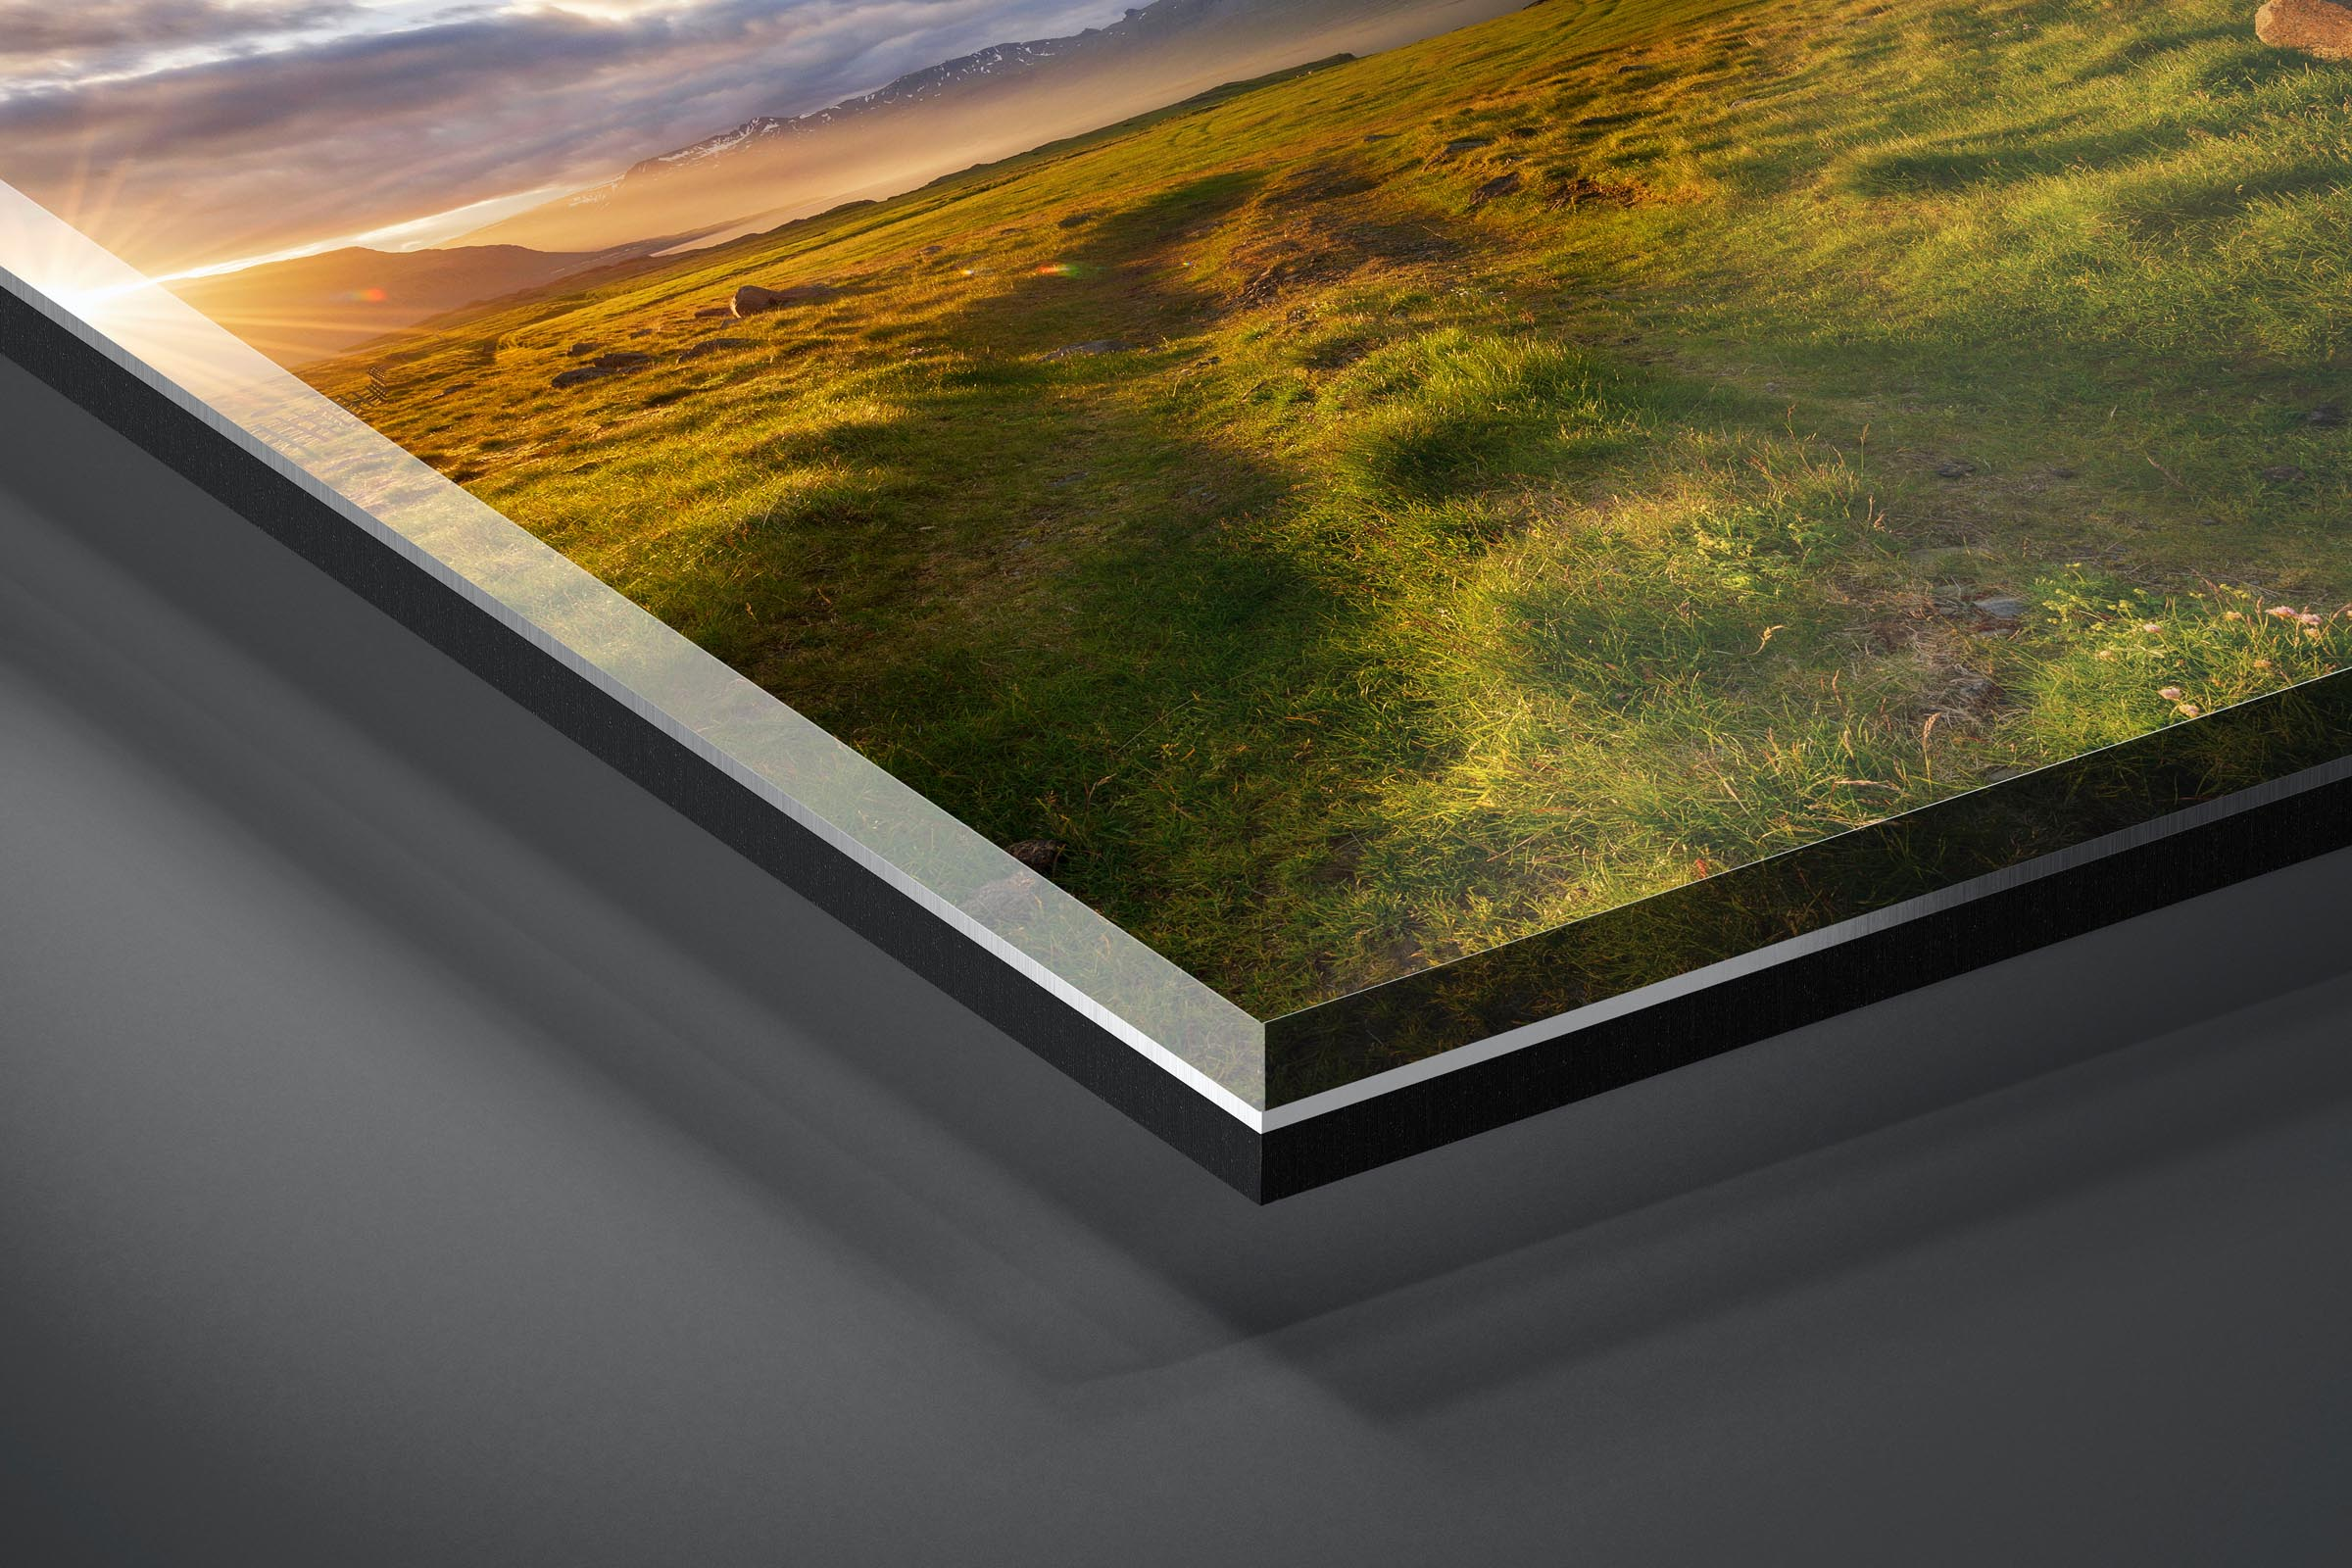 Fine art limited edition acrylic print of Sunburst Meadow in Djupivogur, Iceland by Brent Goldman Photography